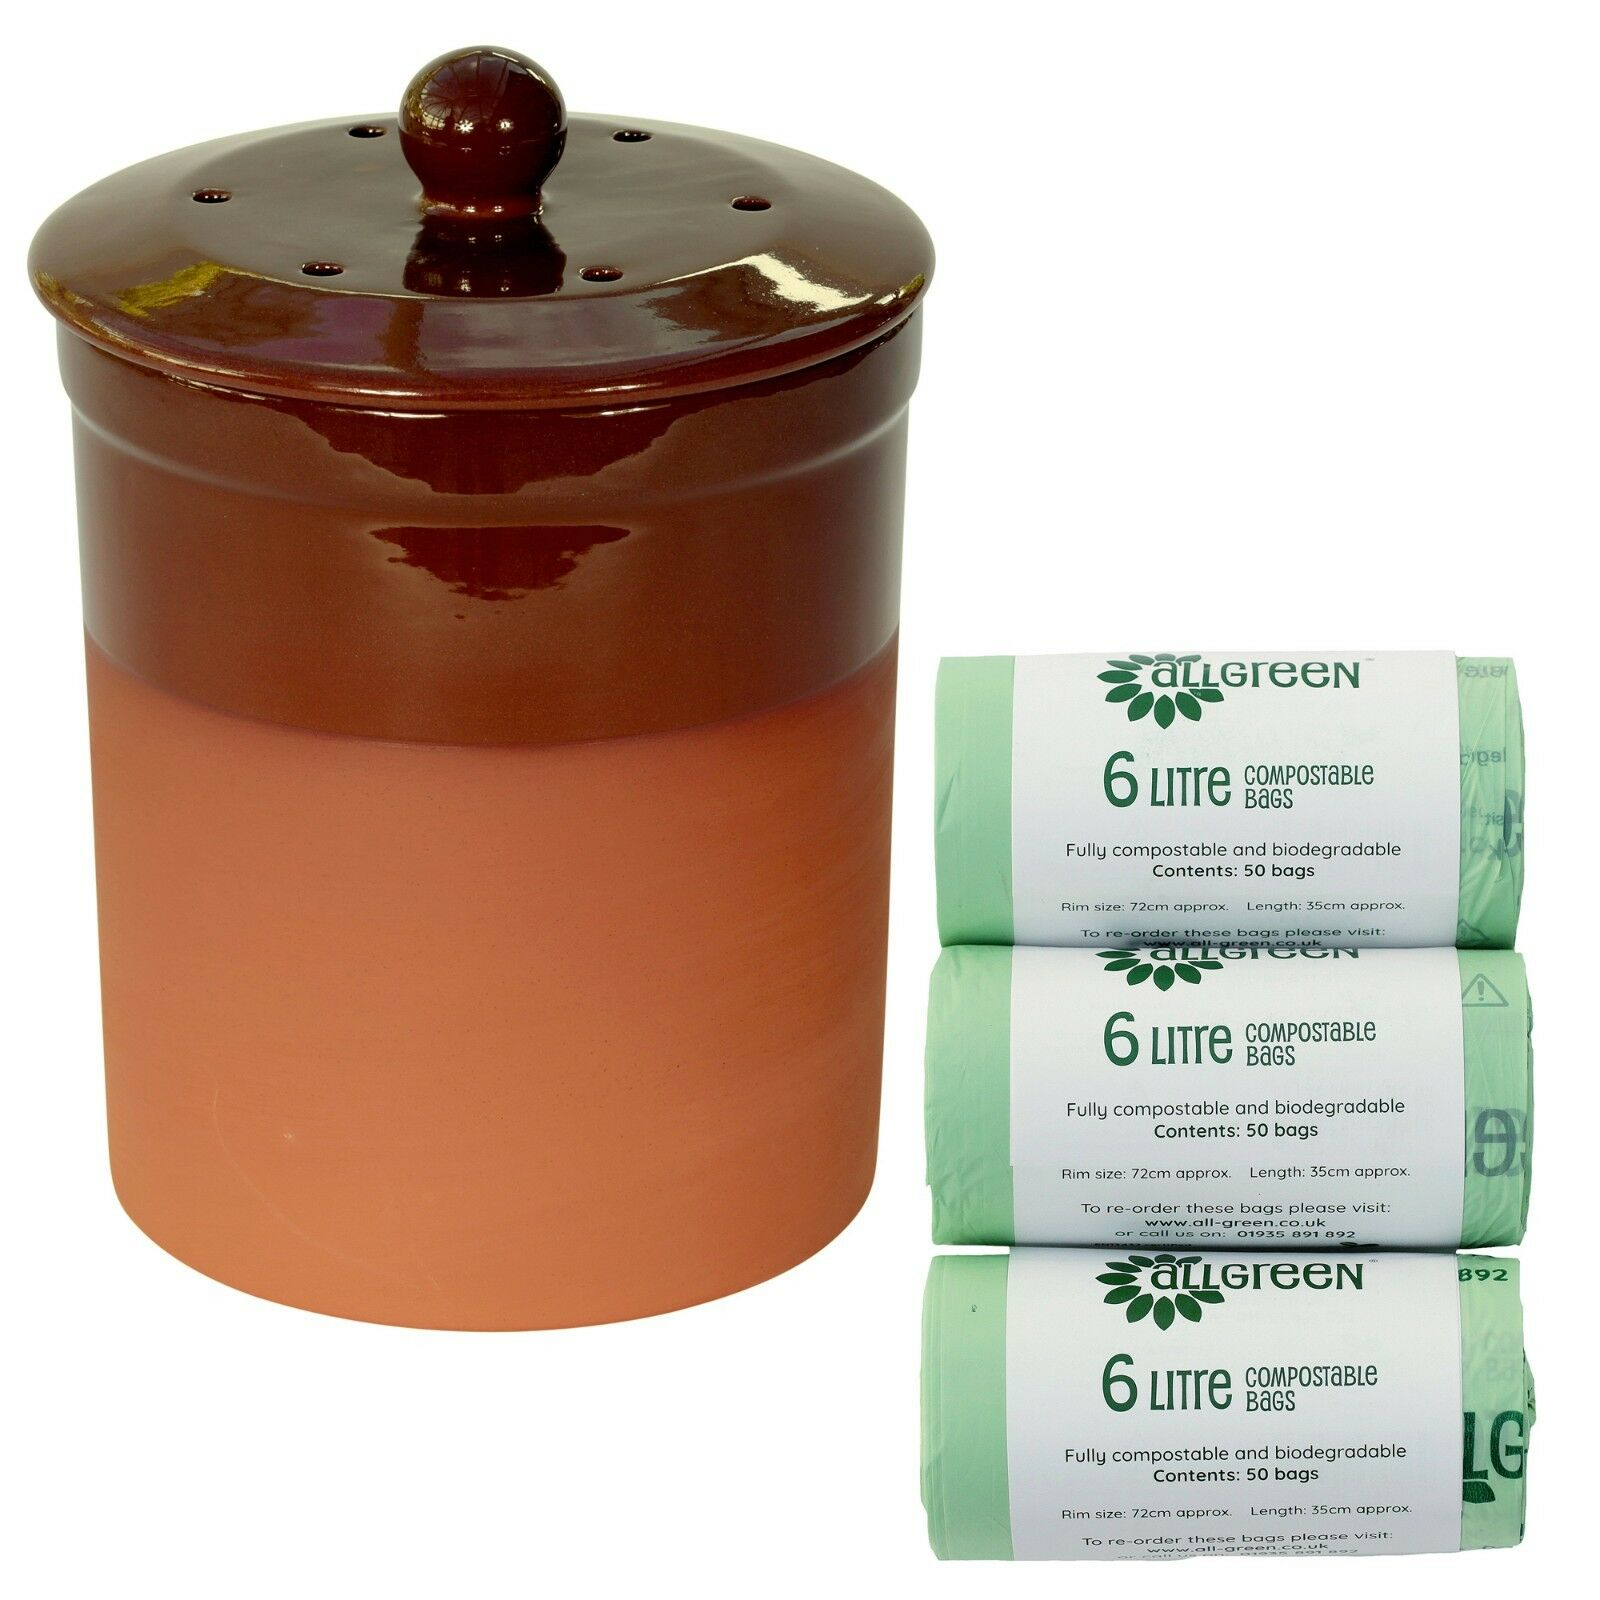 Chetnole Terracotta Compost Caddy - Chocolate braun & 150x Biobags - Kitchen Bin